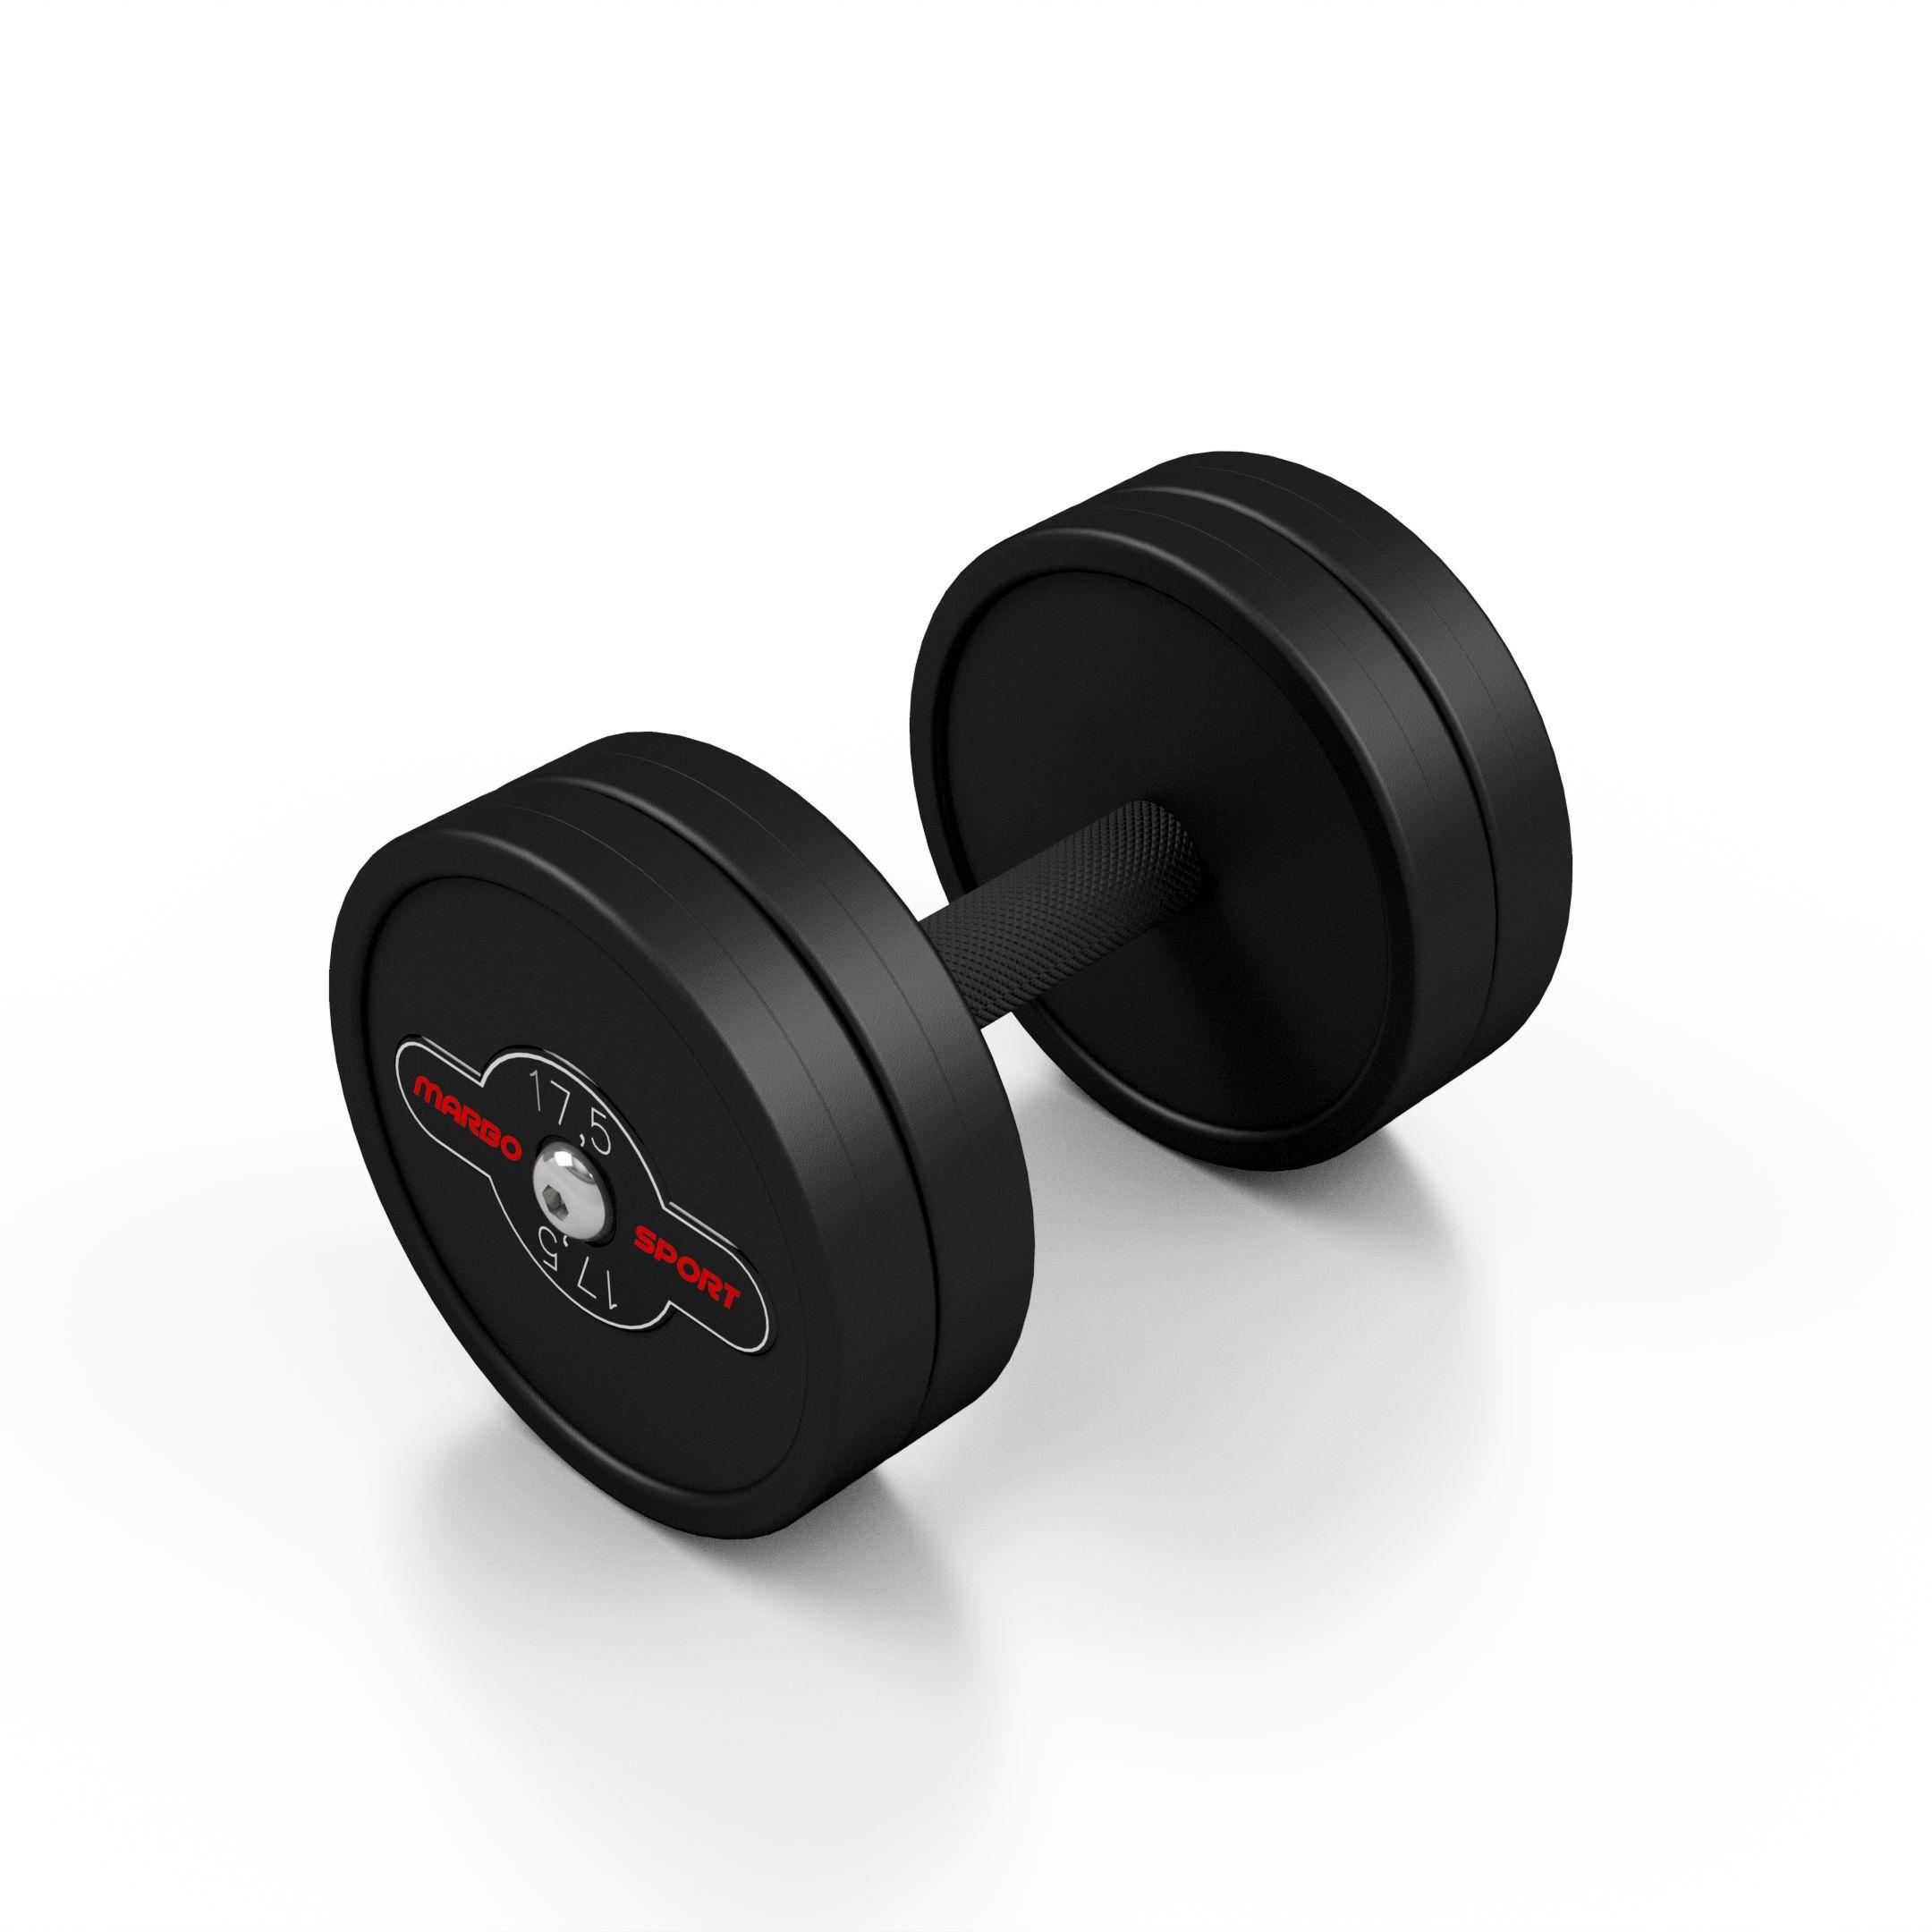 Hantla stalowa gumowana 17,5kg czarny mat - Marbo Sport - 17,5 kg